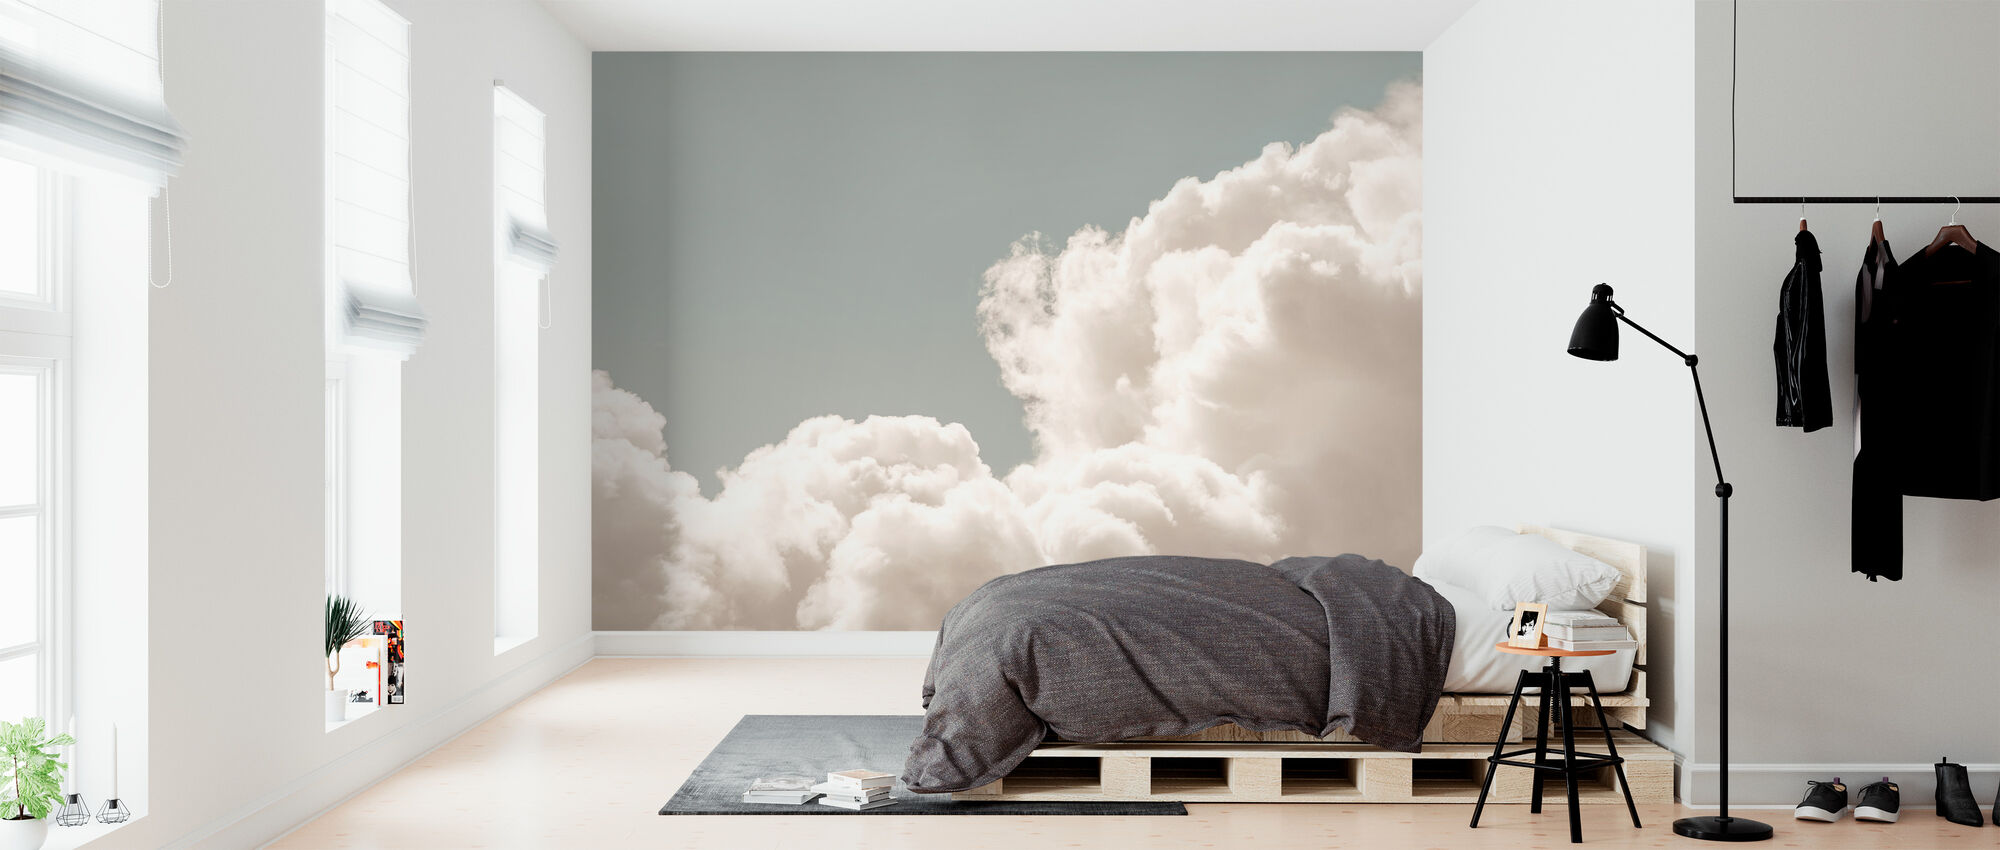 Blush Clouds Daydream Trendy Wall Mural Photowall